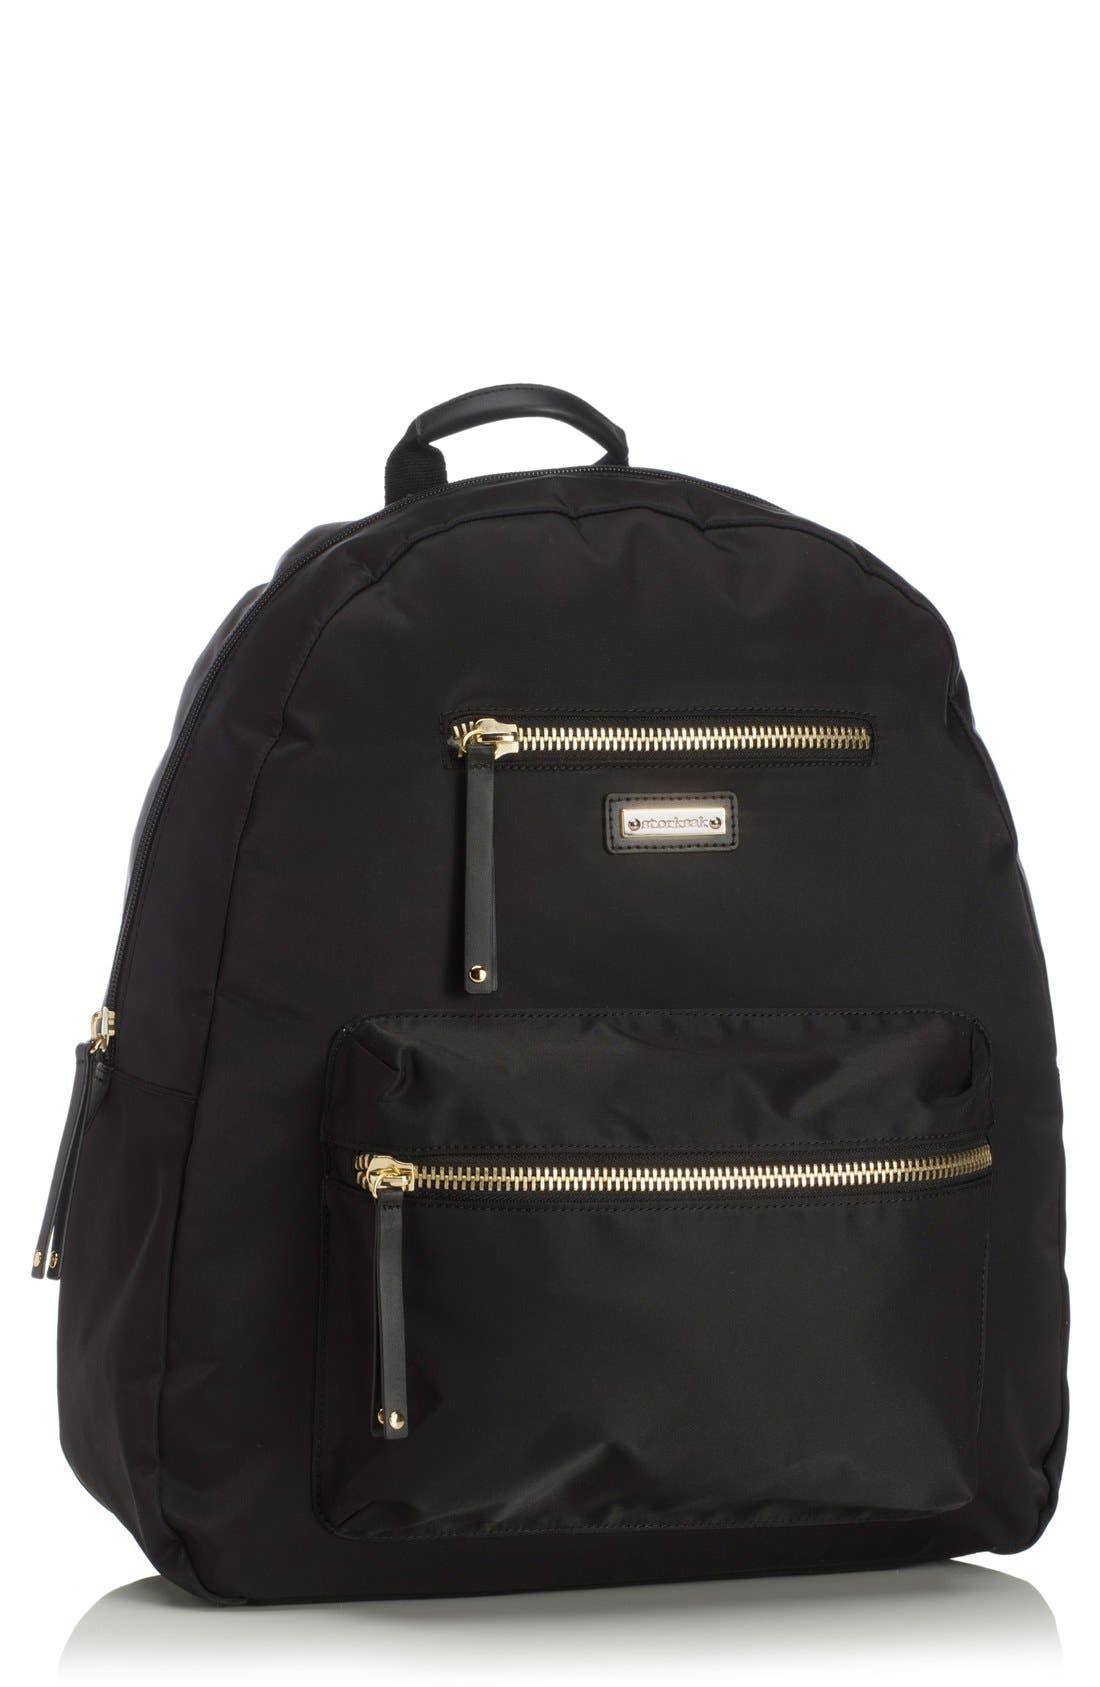 Storksak 'Charlie' Backpack Diaper Bag